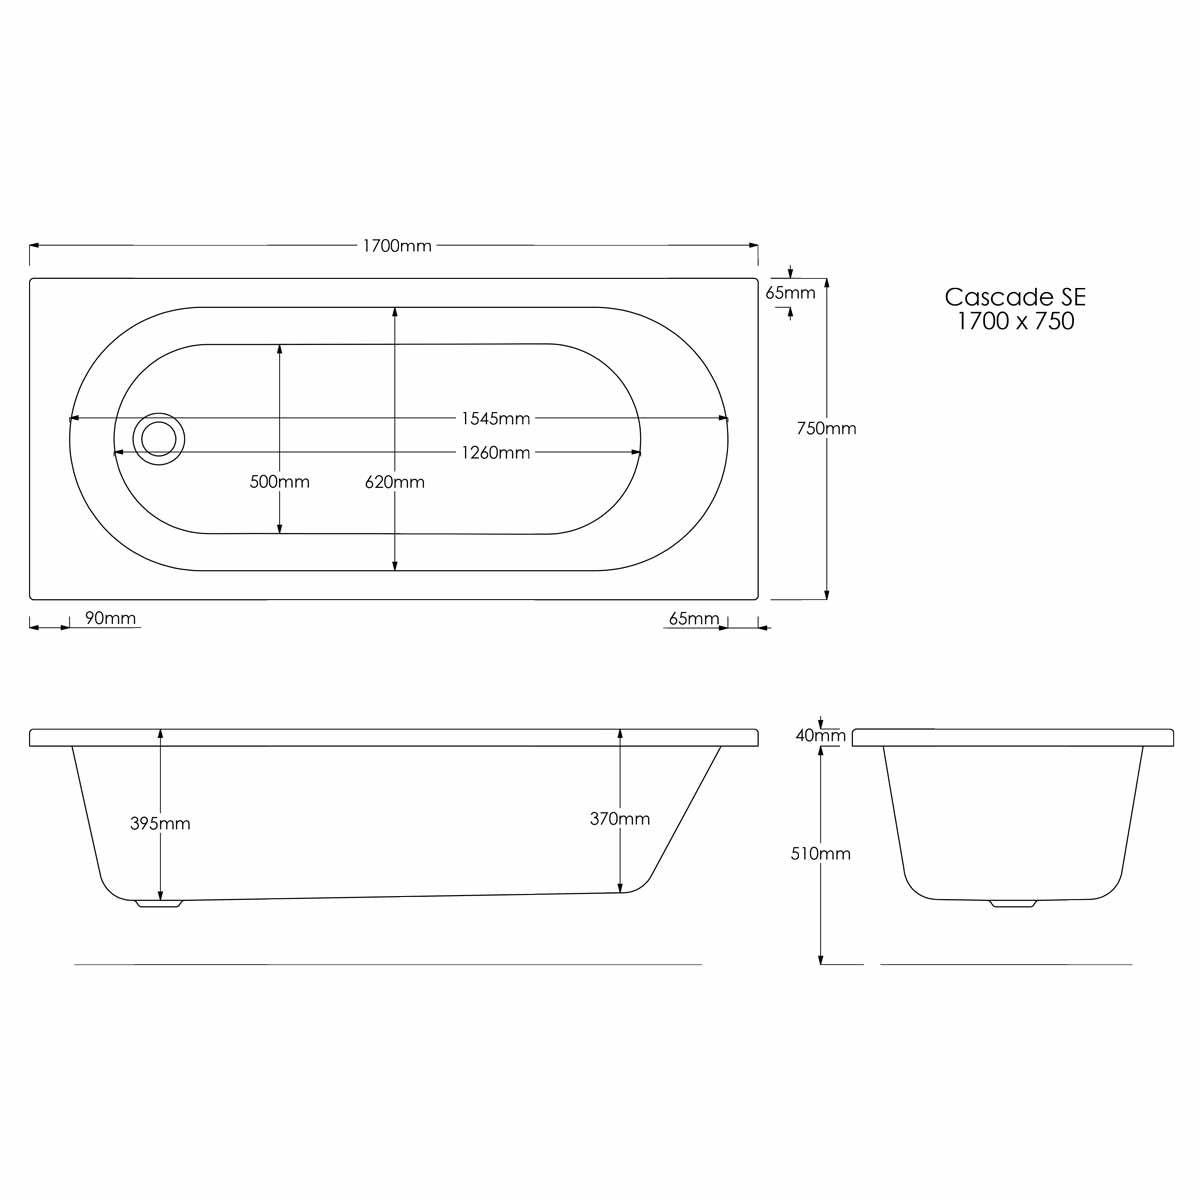 Trojan Cascade Reinforced Single Ended Bath 1700 x 750 Dimensions